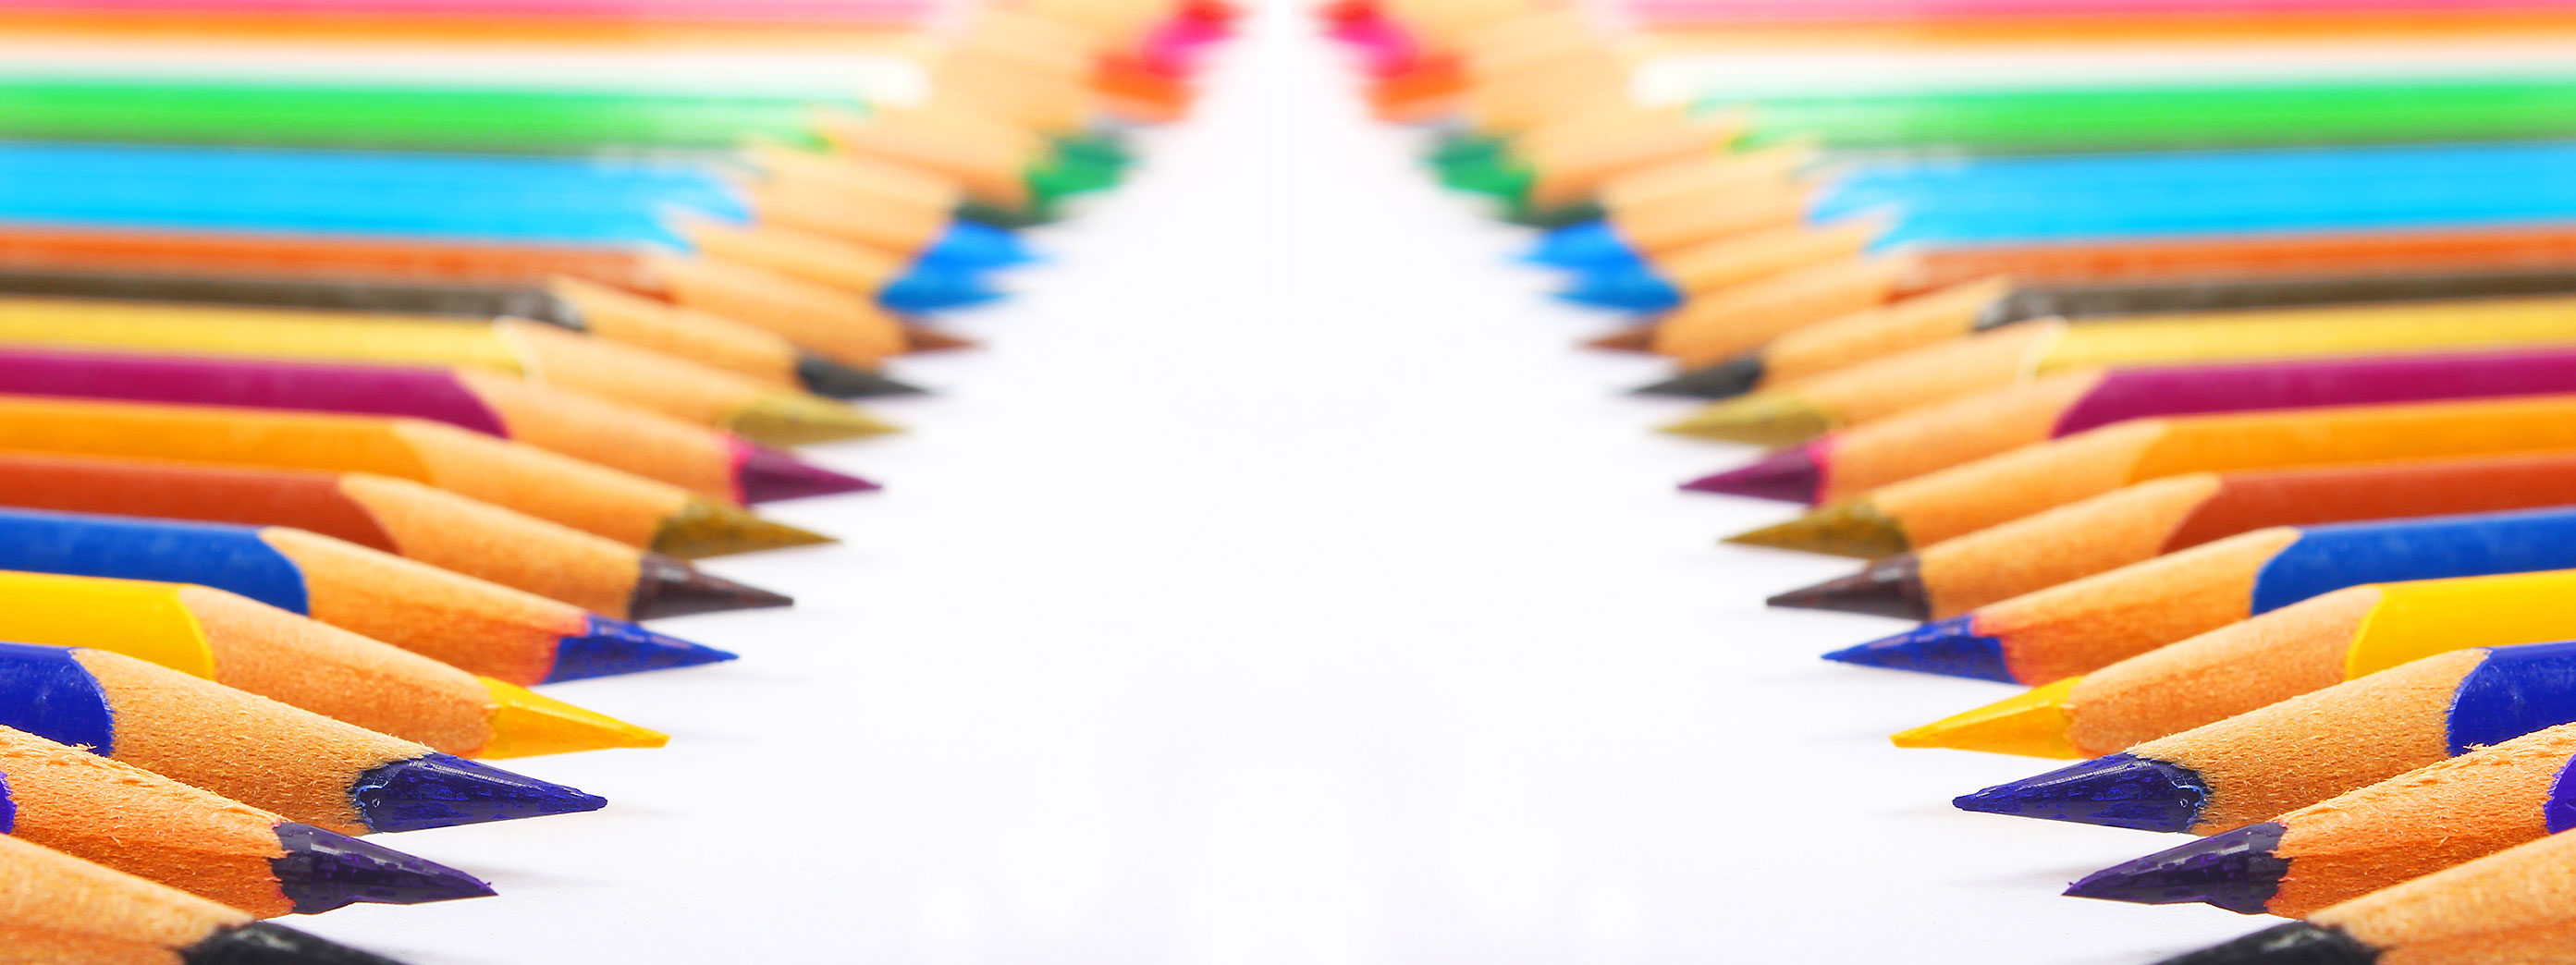 aligned colored pencils